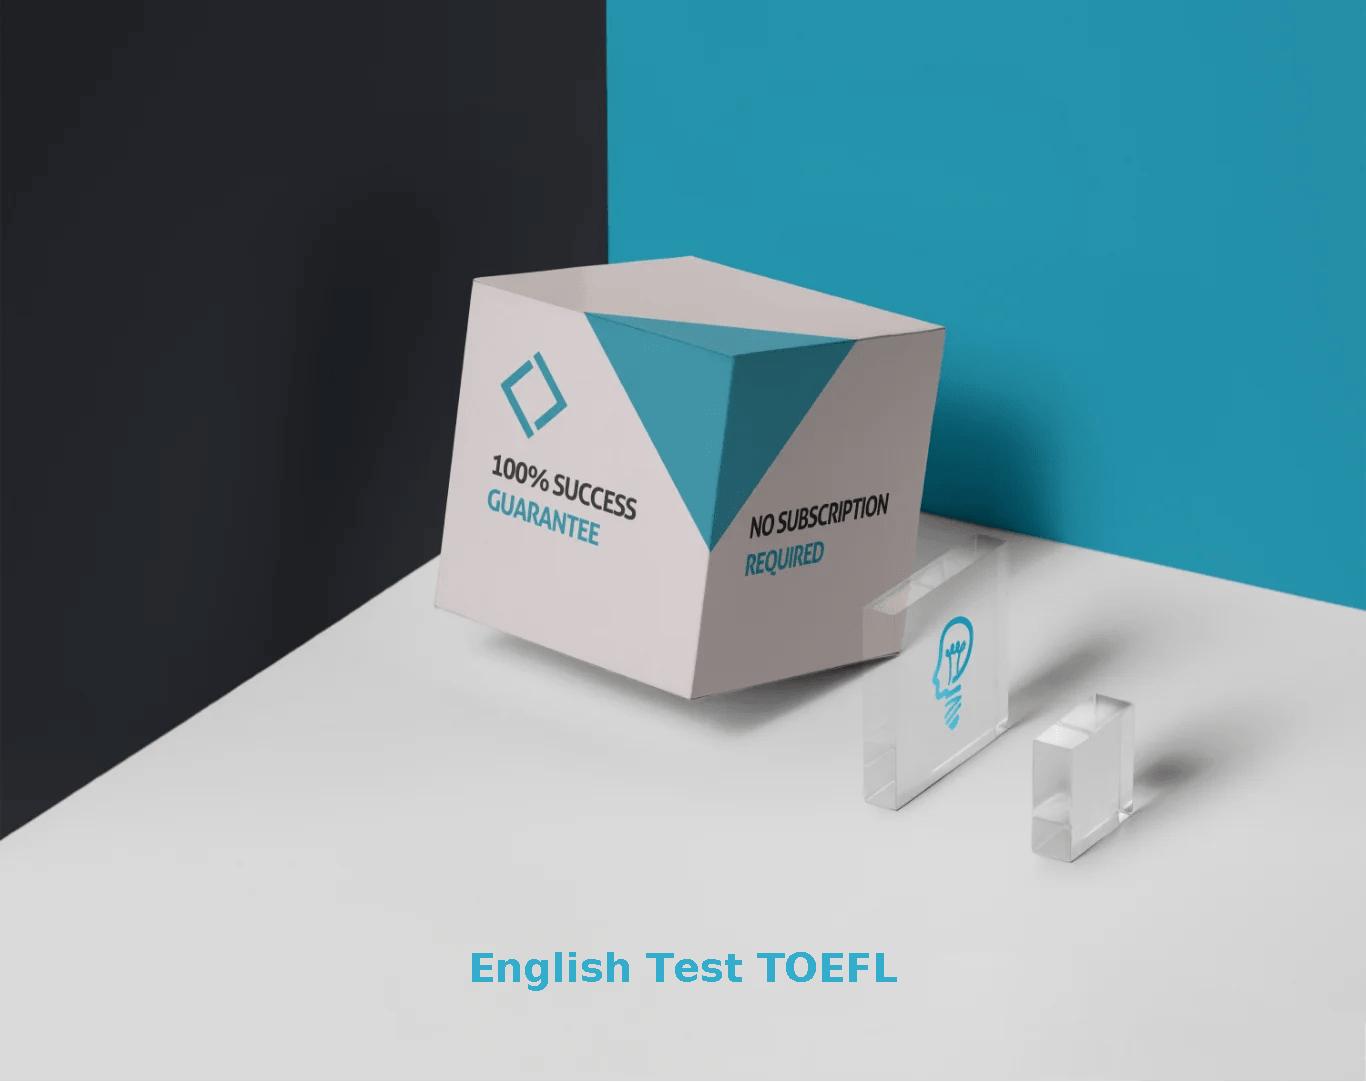 English Test TOEFL Exams